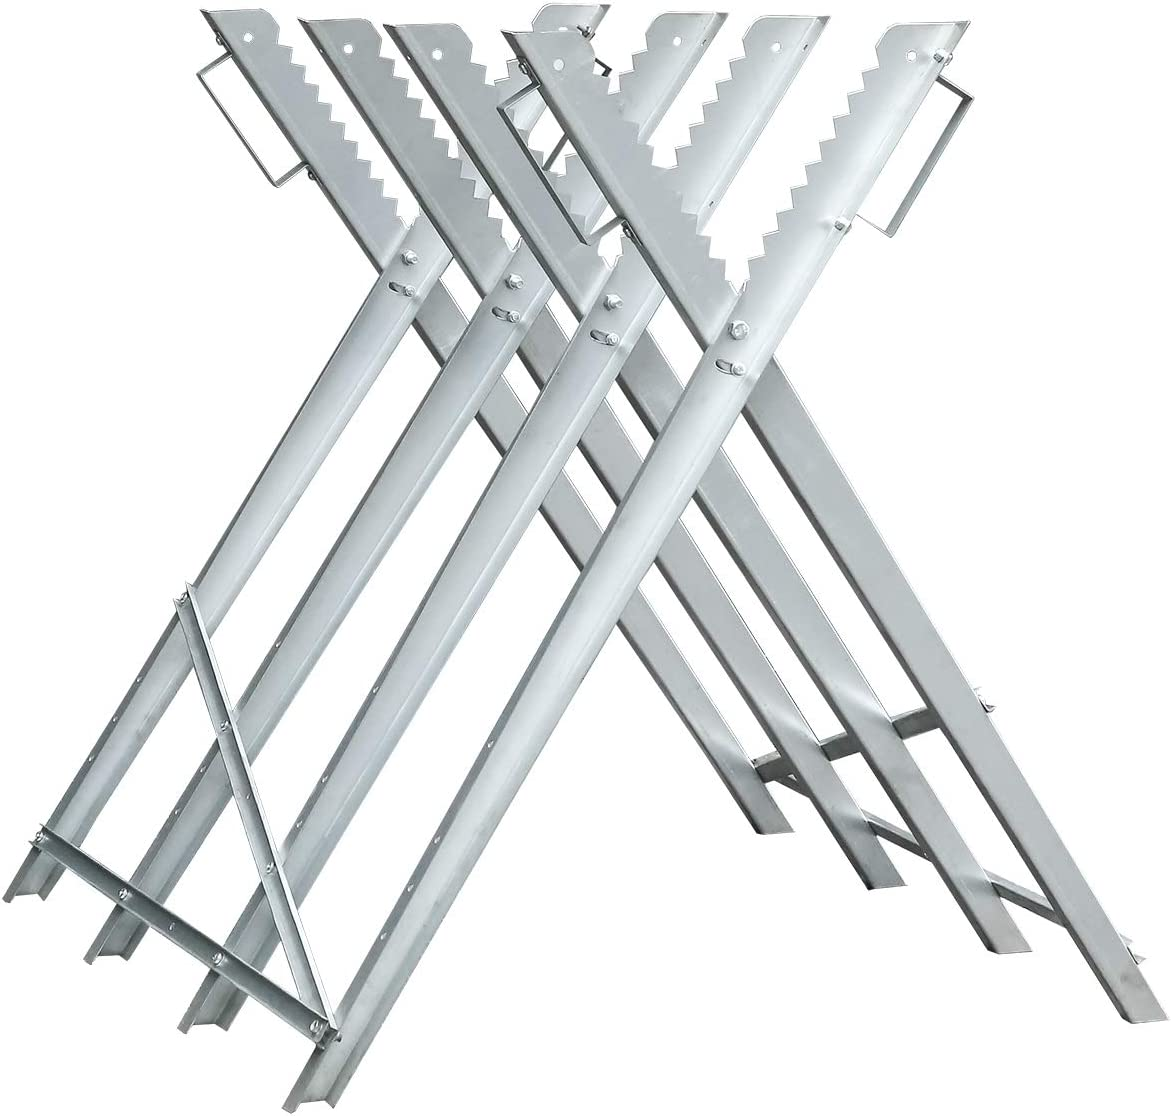 Hengda Caballete para serrar leña Soporte Para Cortar leña Soportes Dentados Ajustble y Plegable Banco corte con asas plegable Capacidad de carga máx 150kg